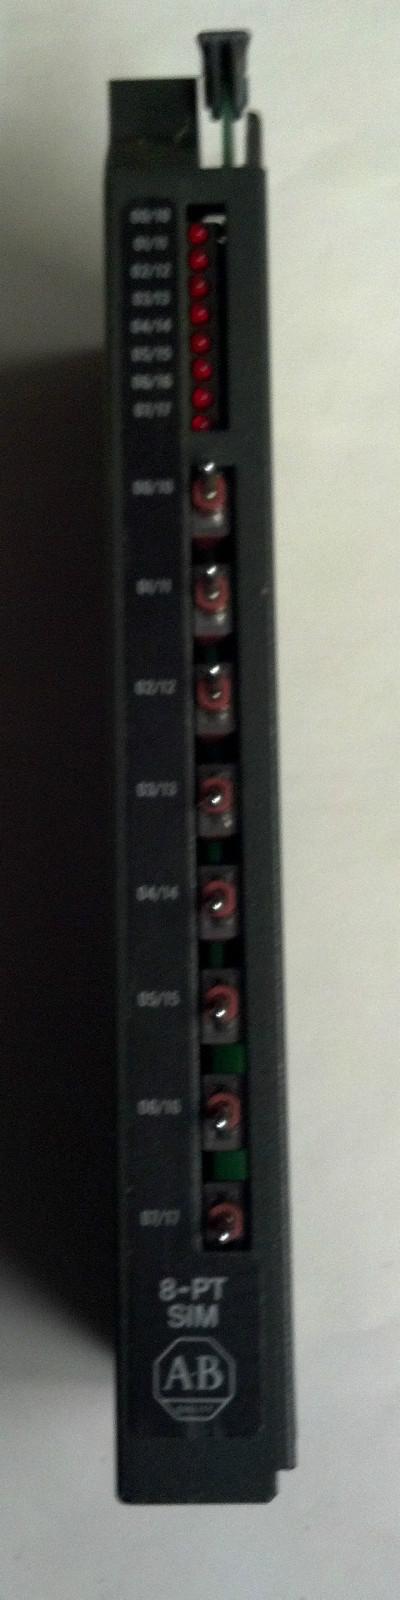 AB 羅克韋爾1771-SIM,PLC-5系列輸入輸出仿真模塊